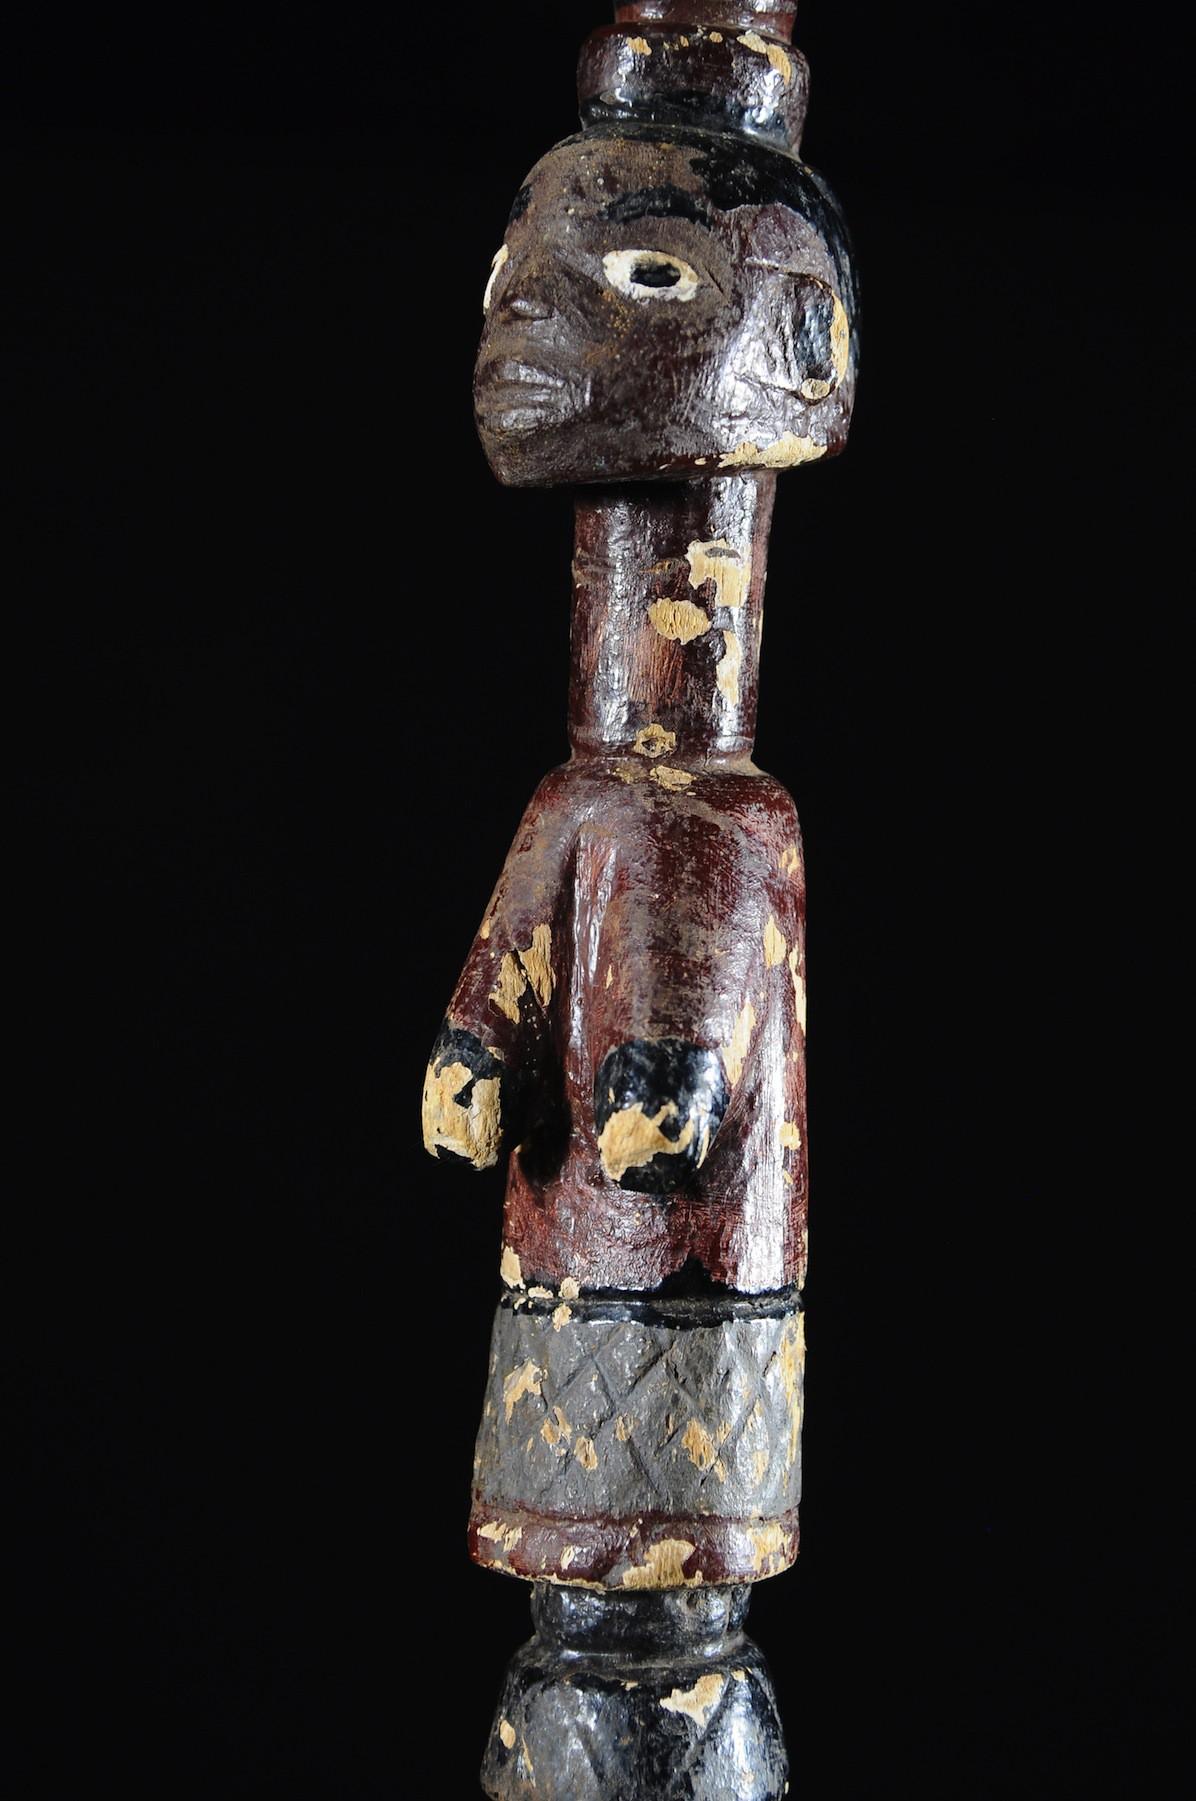 Canne polychrome de fiancailles - Mossi - Burkina Faso - Objets de regalia